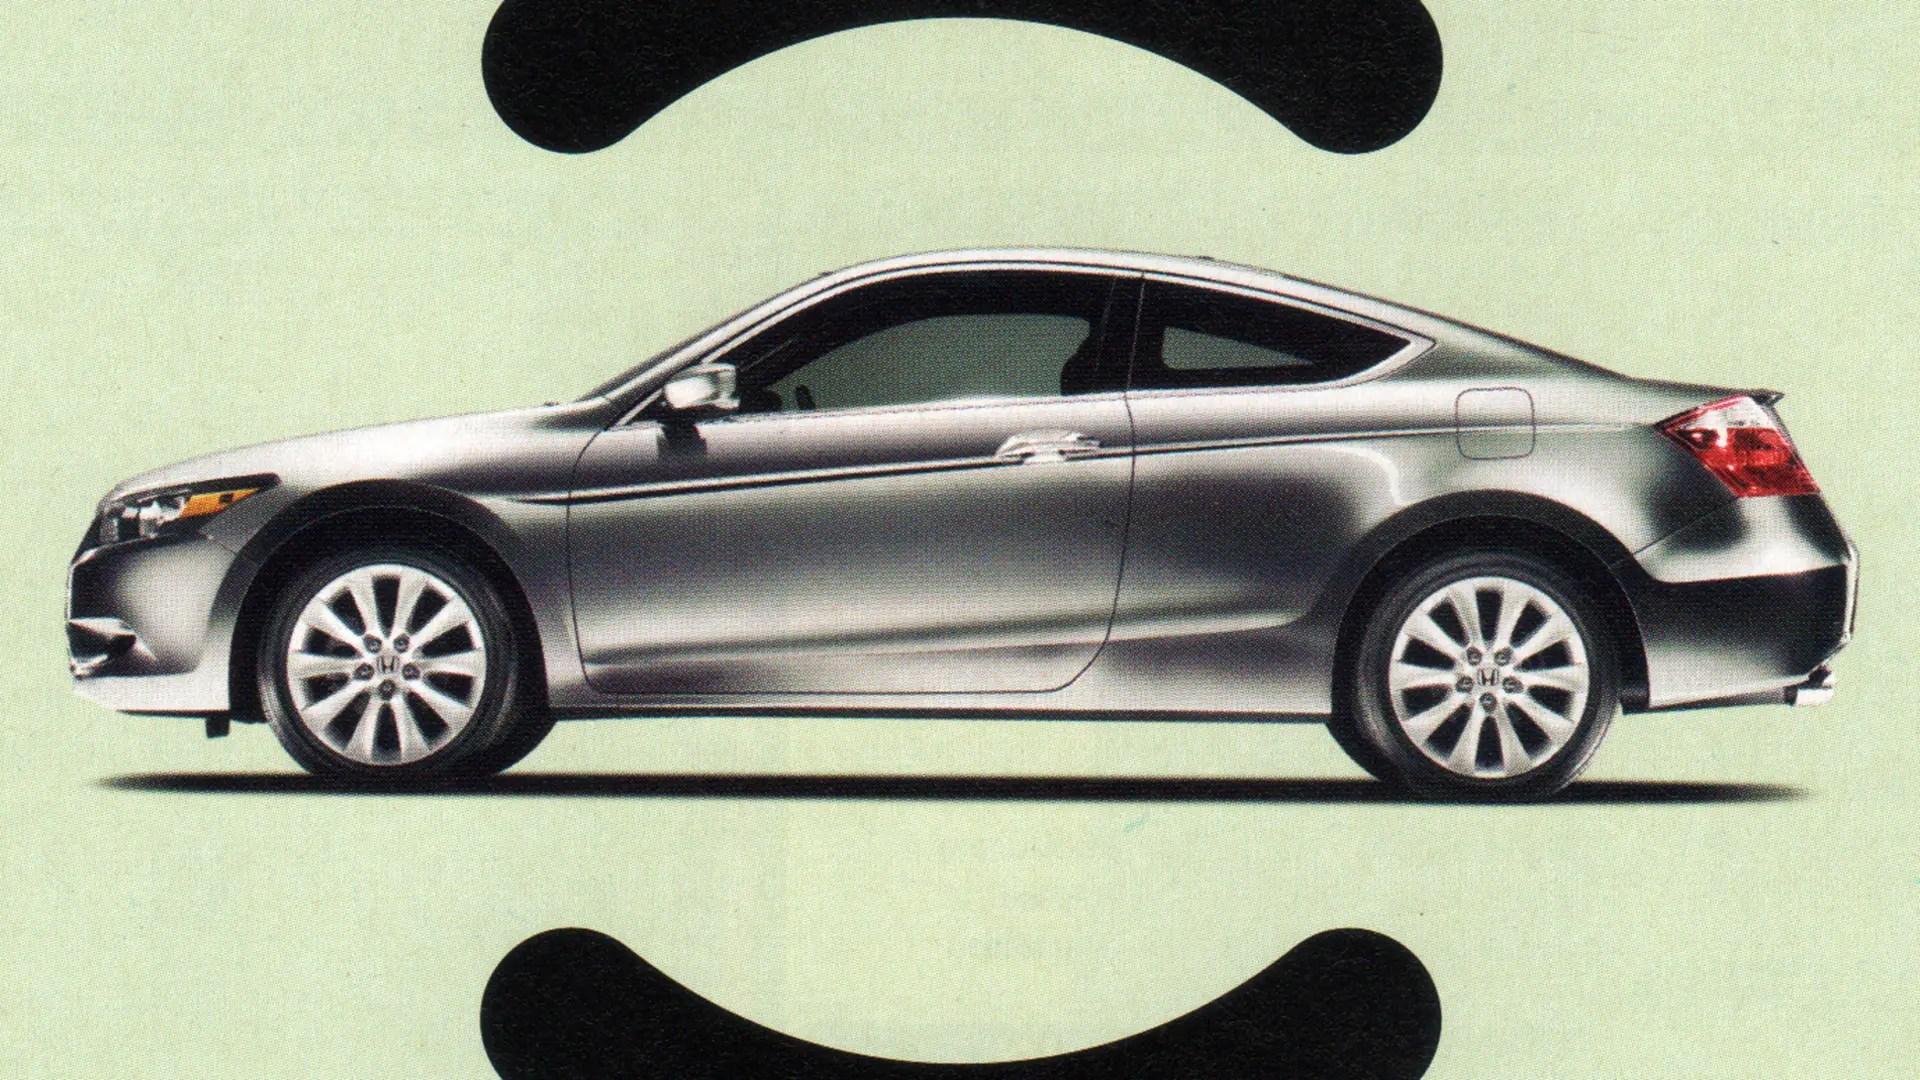 Honda's Subdomains